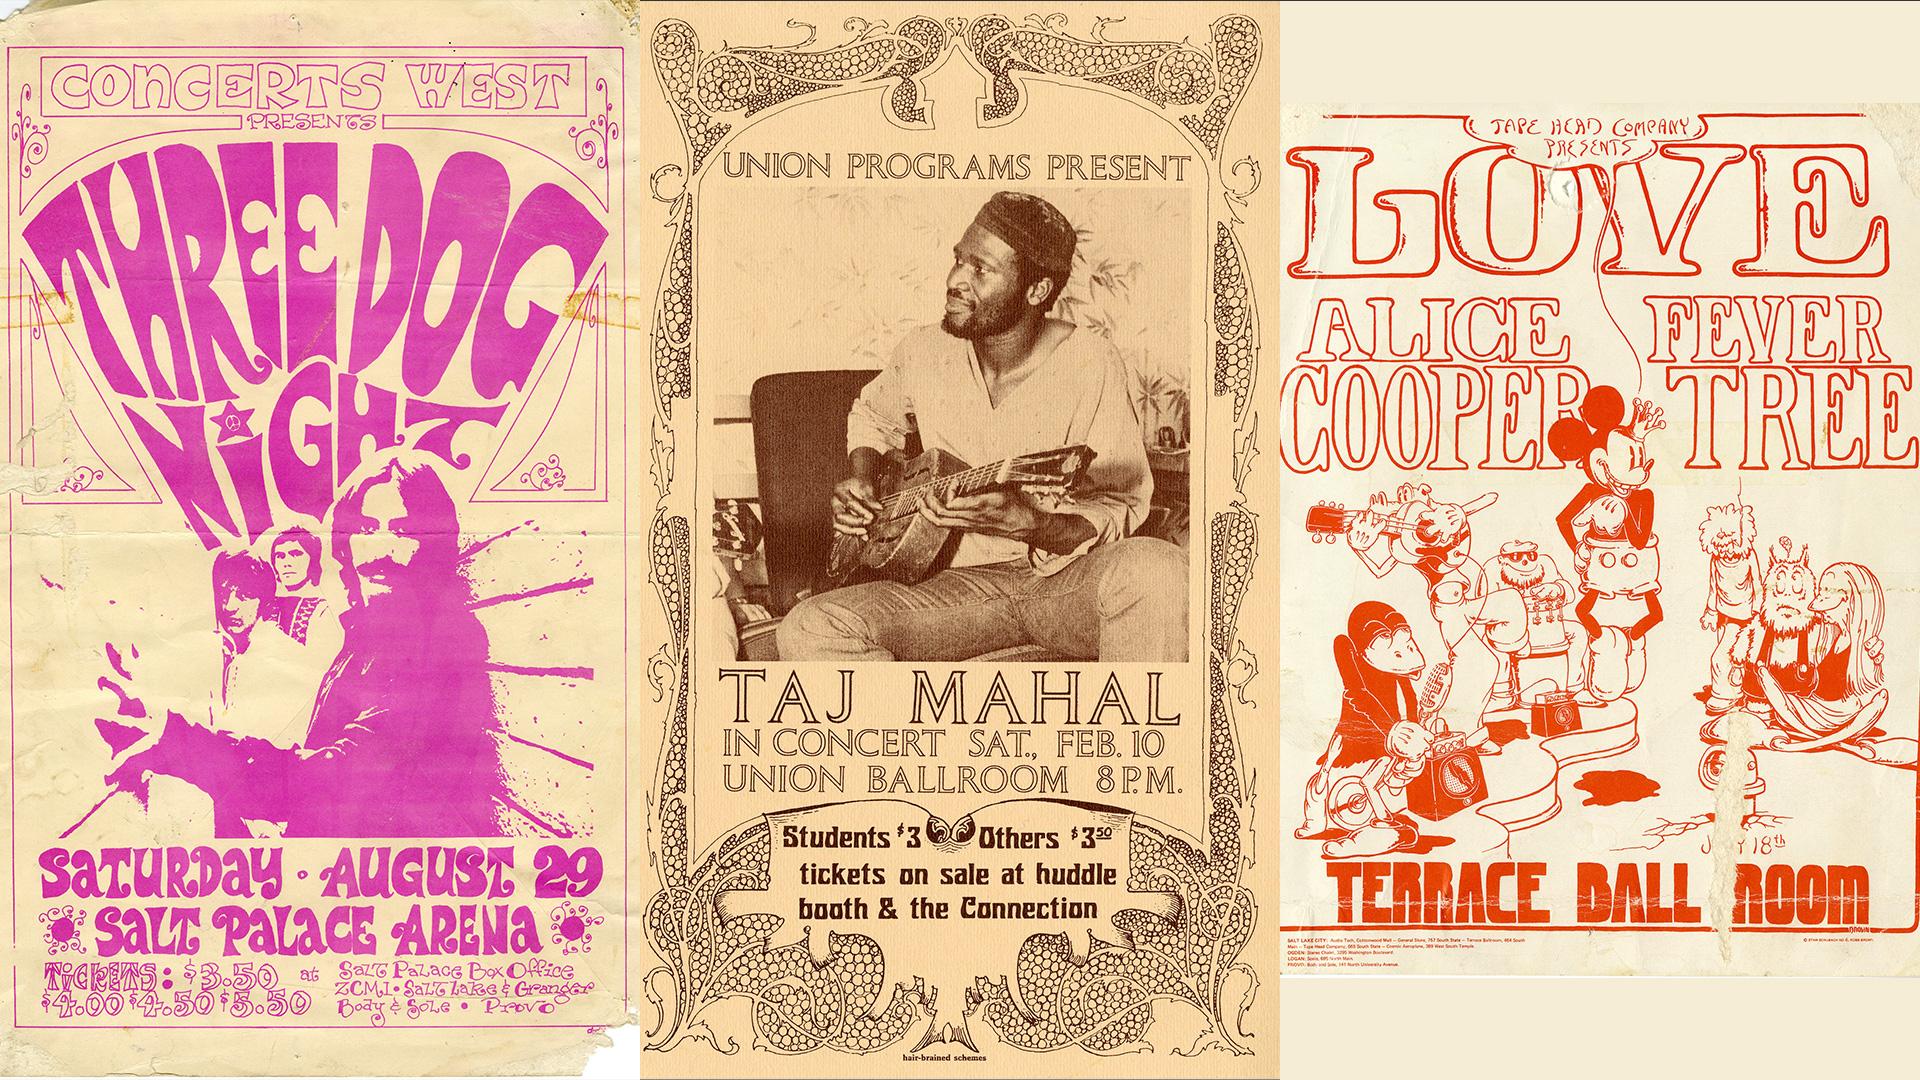 ThreeDogNight_TajMahal_AlicCooper_PosterTrio